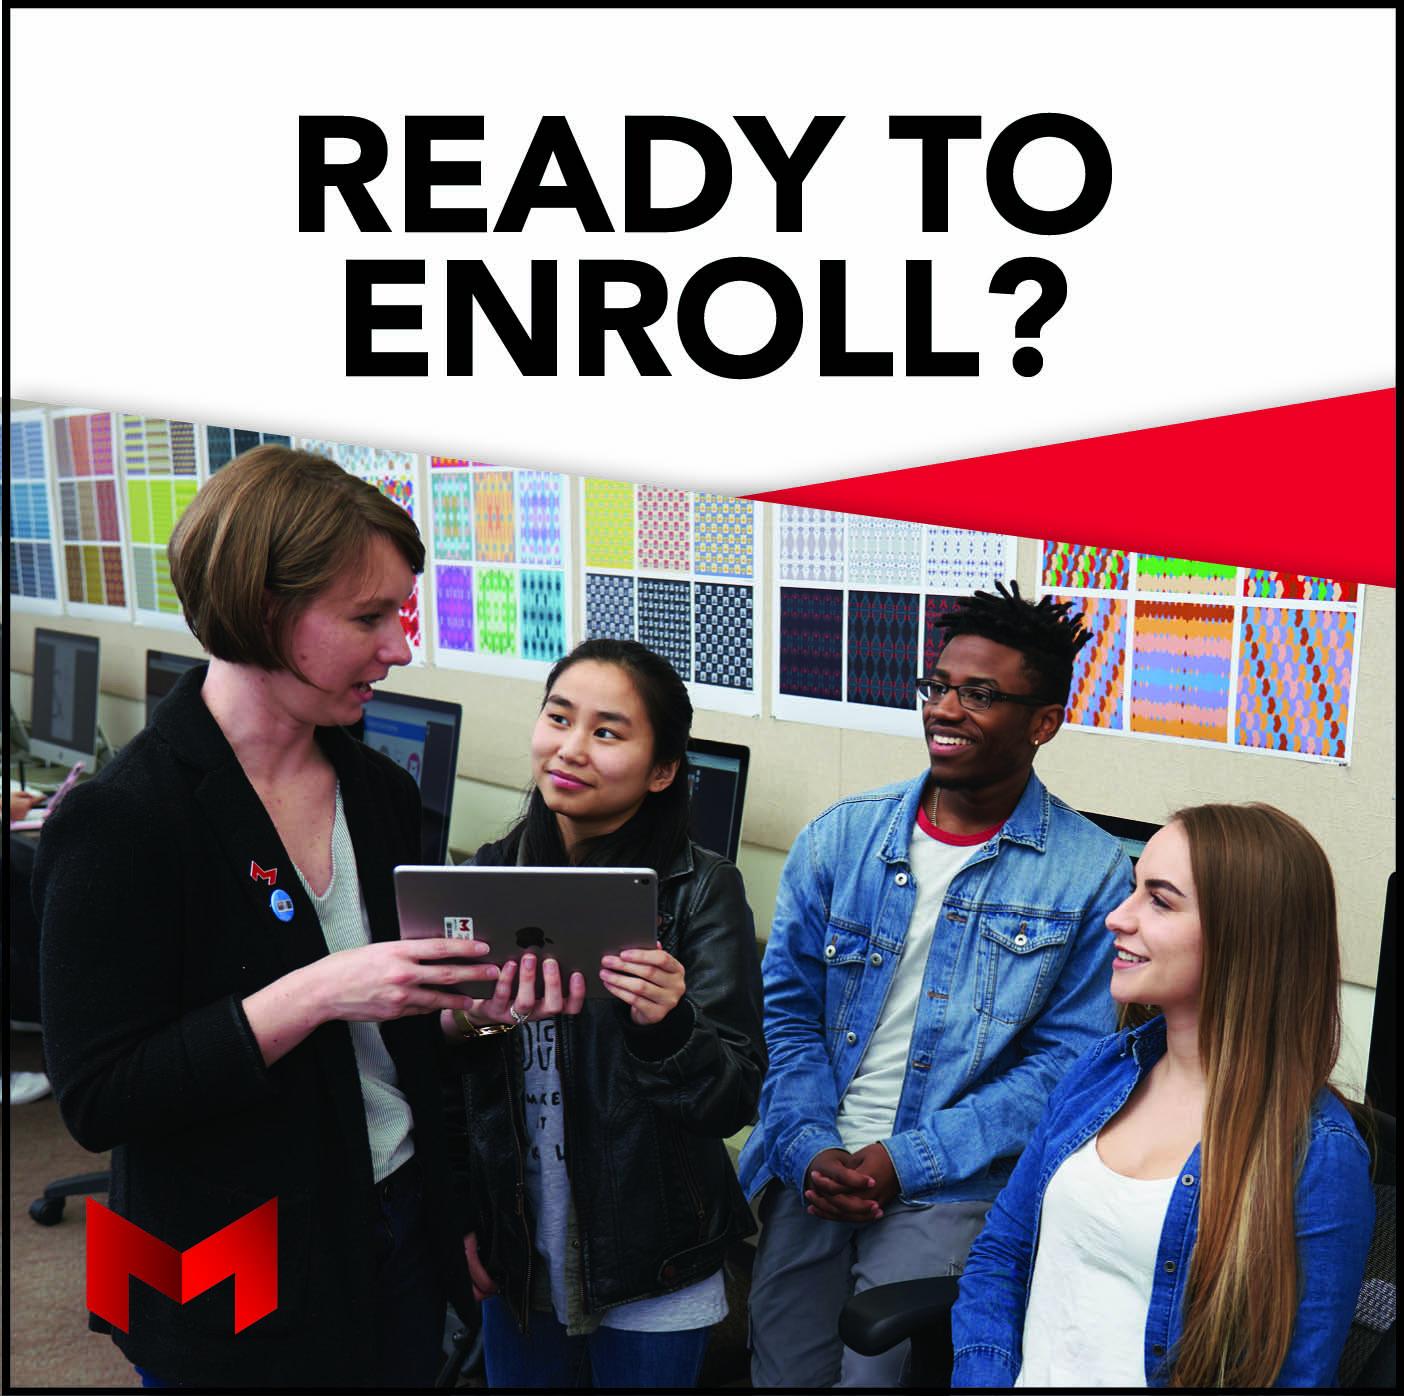 ready to enroll ad